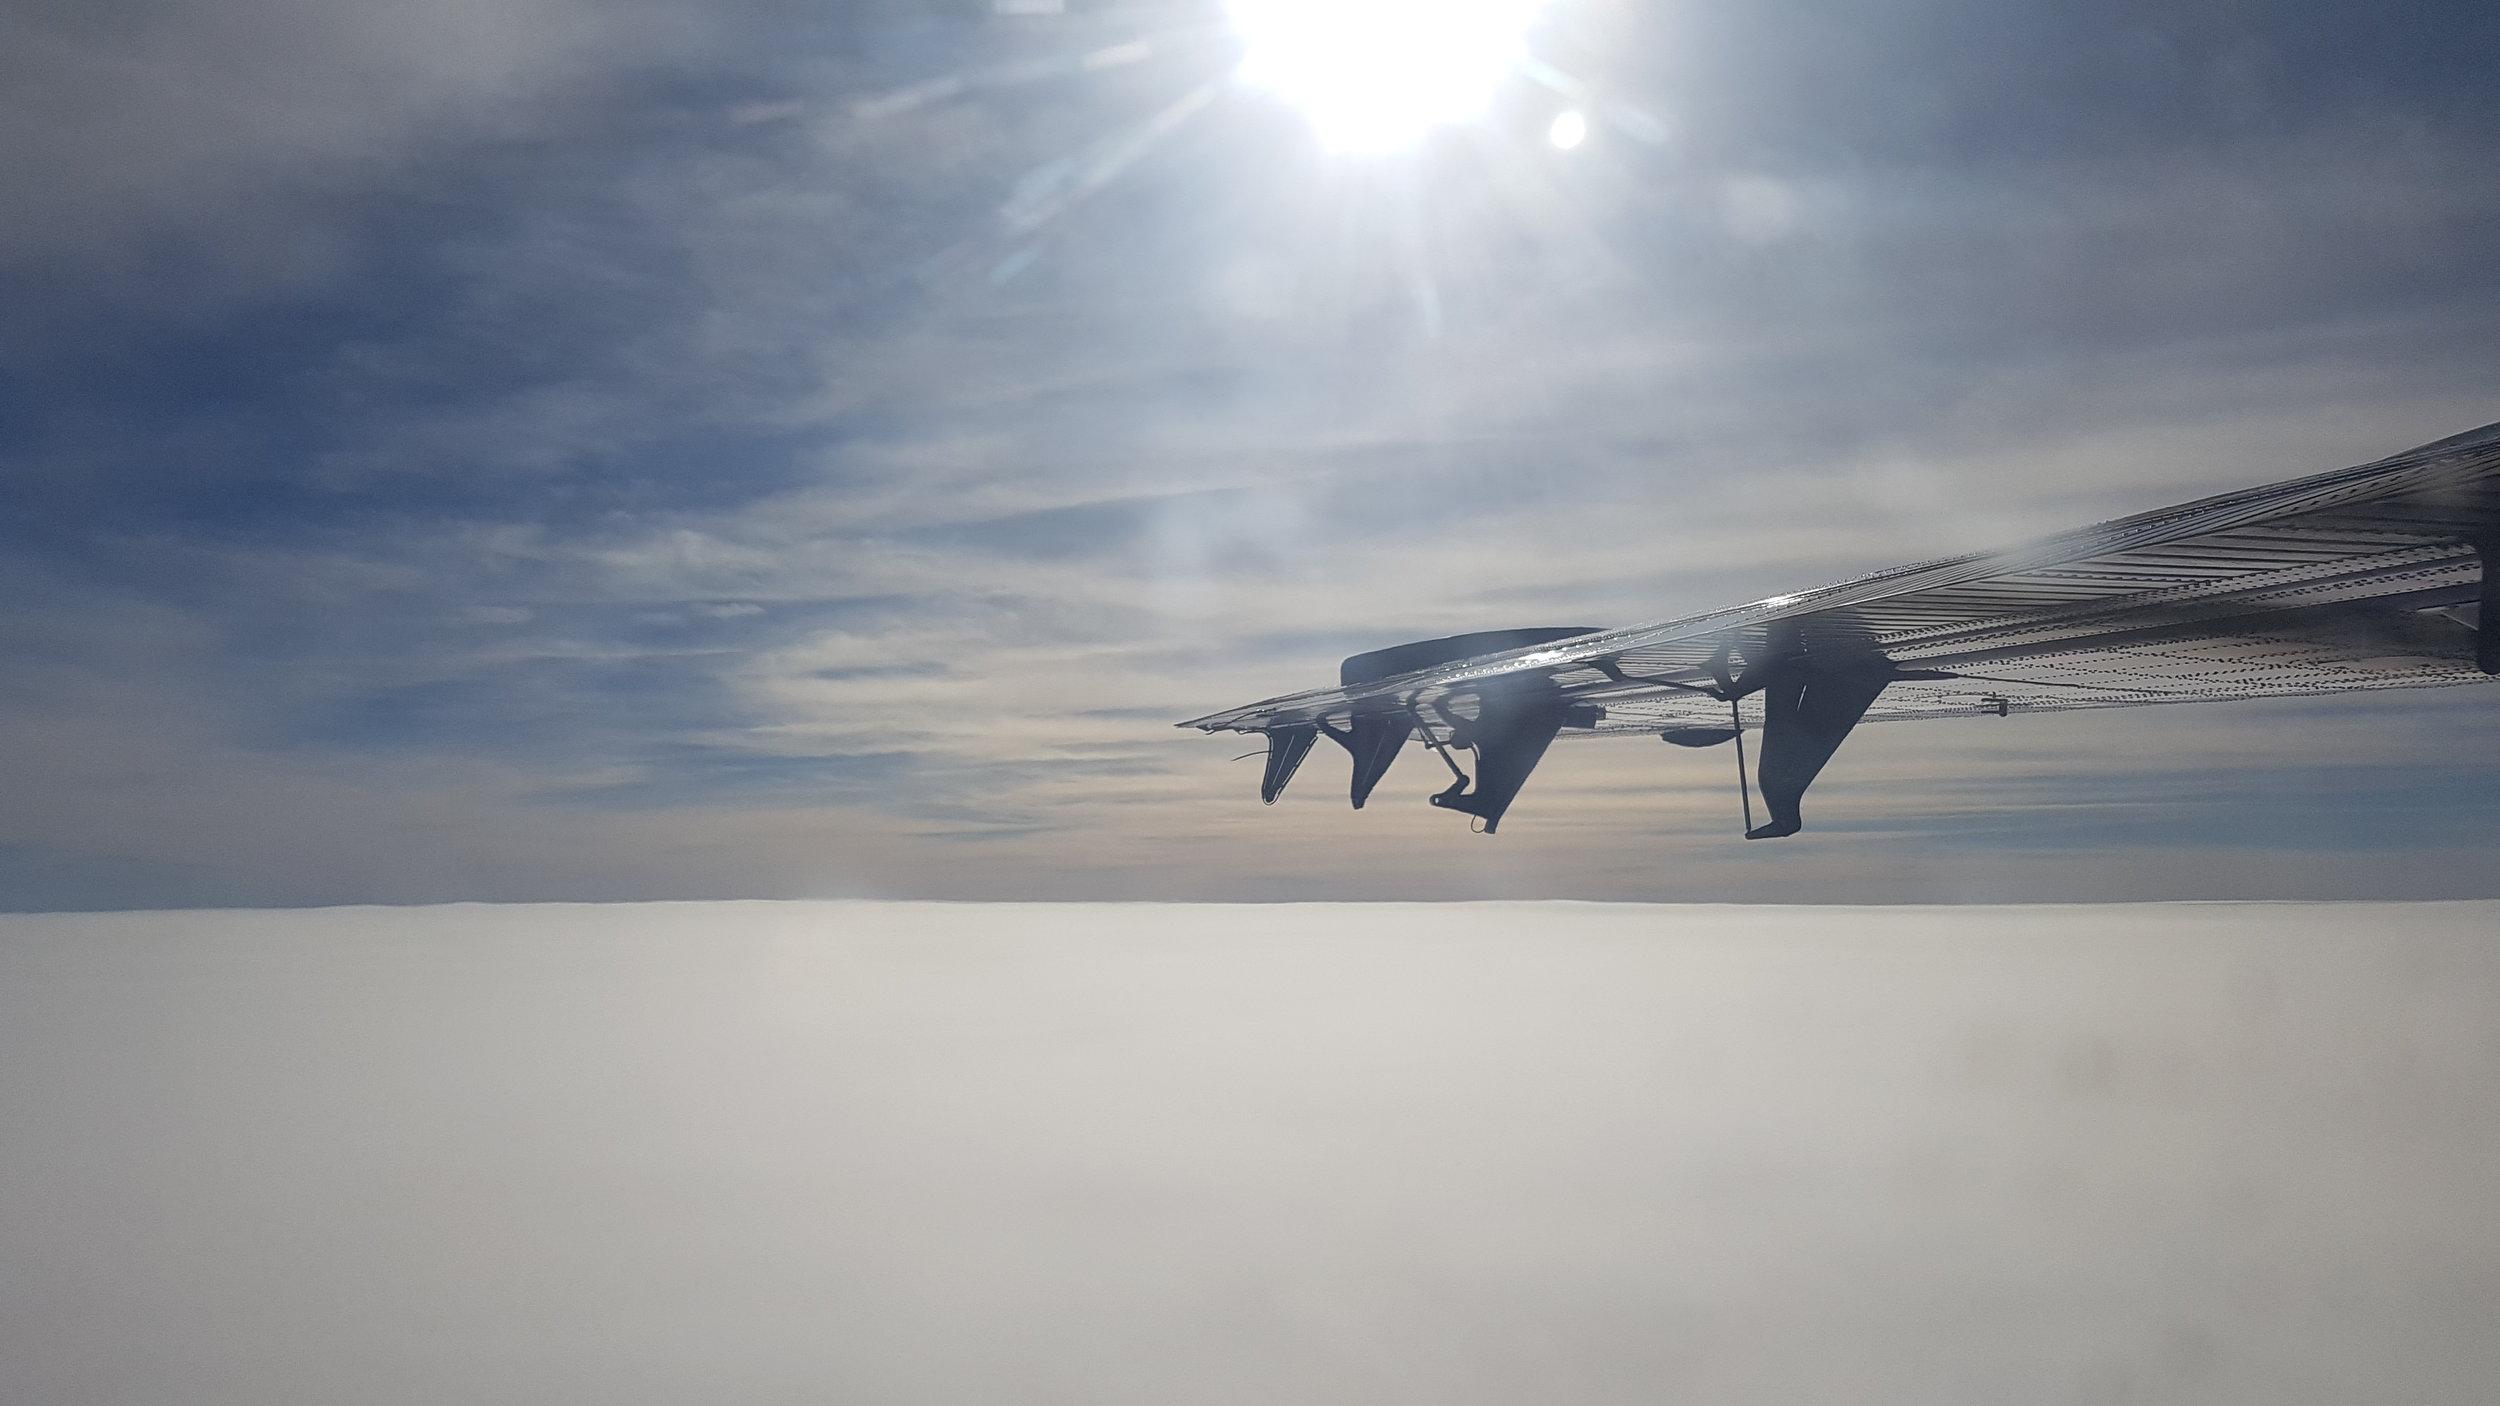 Thick cloud band, where's the beach runway?